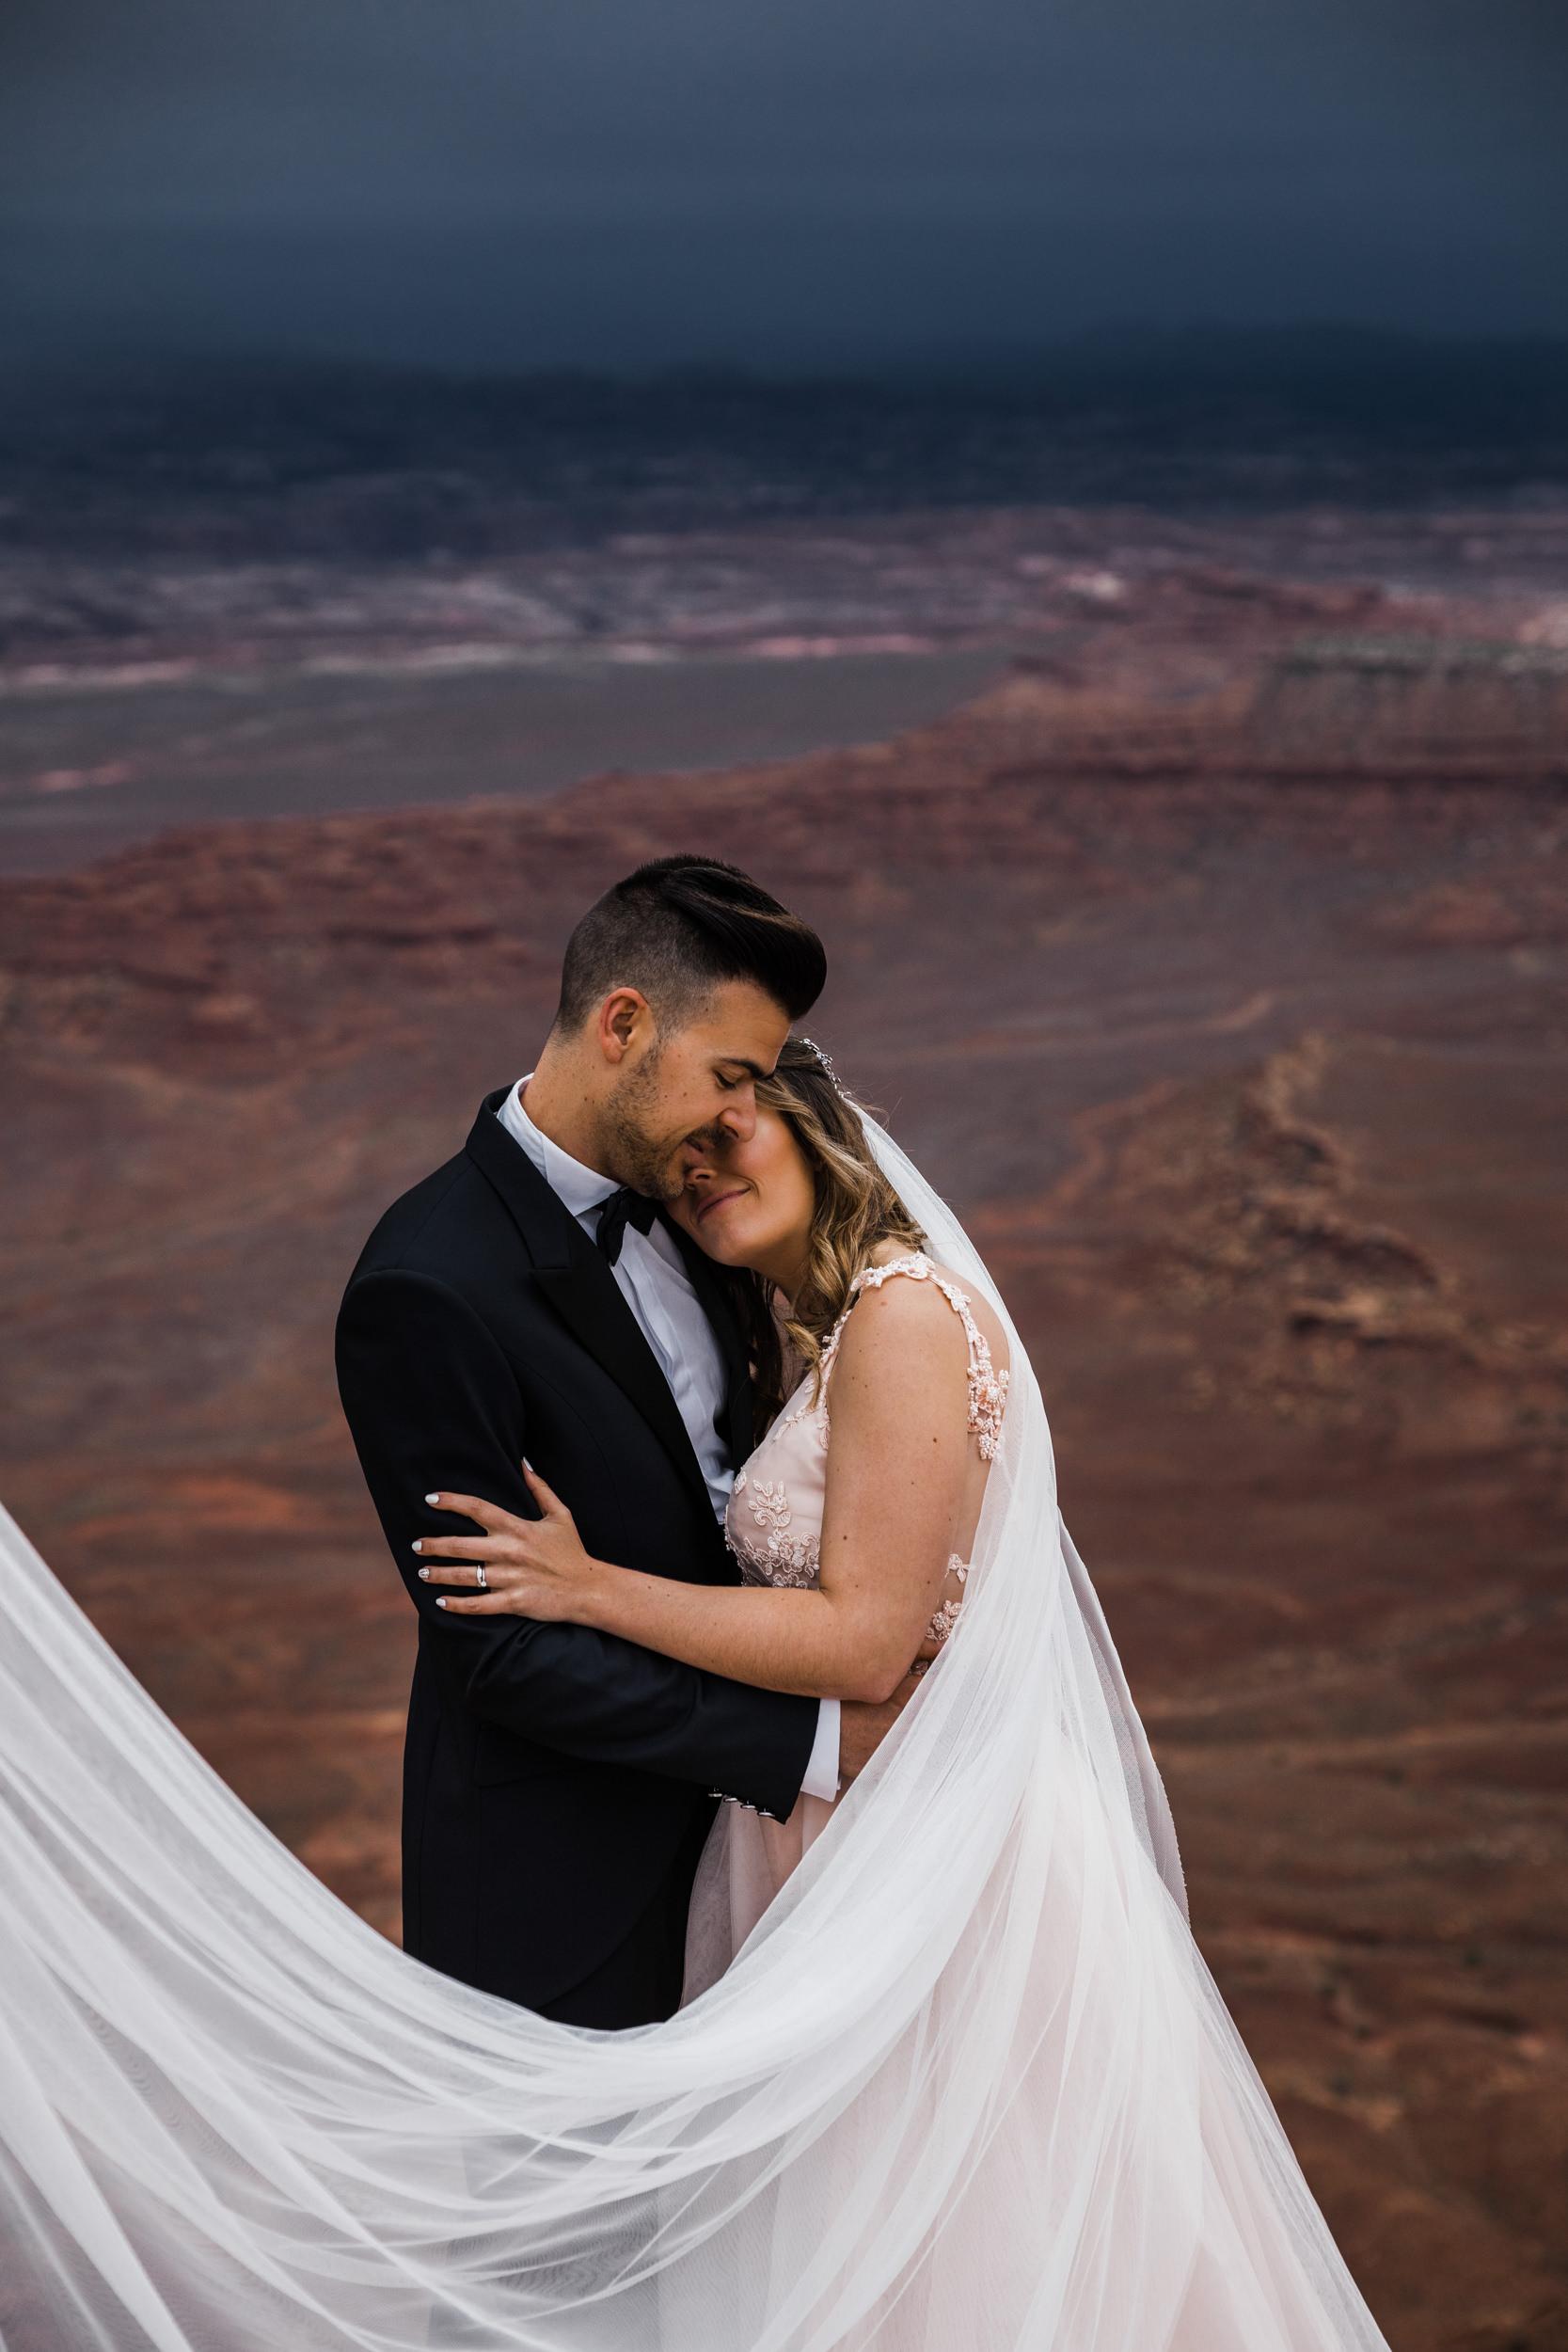 Hearnes-Elopement-Photography-Canyonlands-National-Park-Moab-Wedding-23.jpg